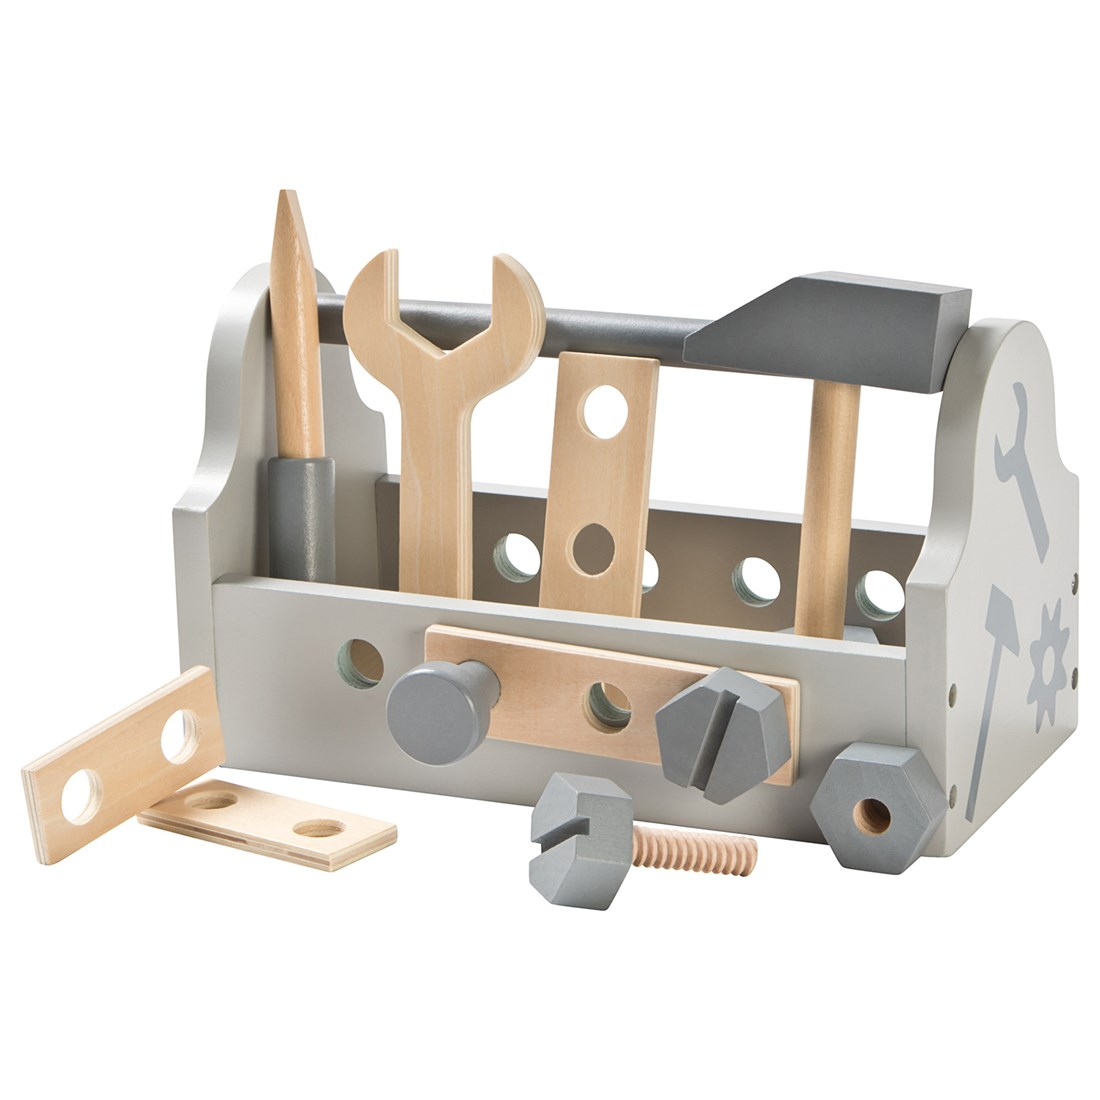 Leksaker 2 år - verktygslåda